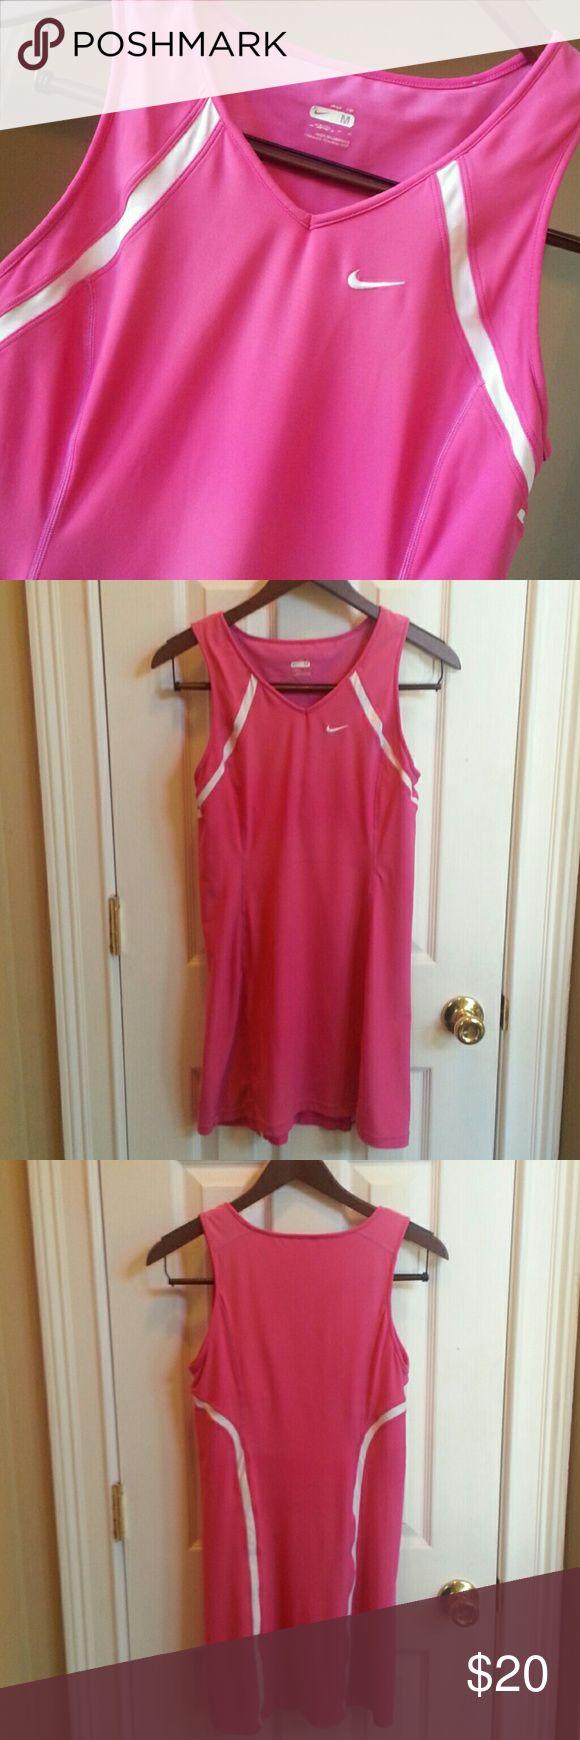 Nike Dress Nike hot pink tennis dress. Polyester and spandex blend. Shelf bra. Nike Dresses